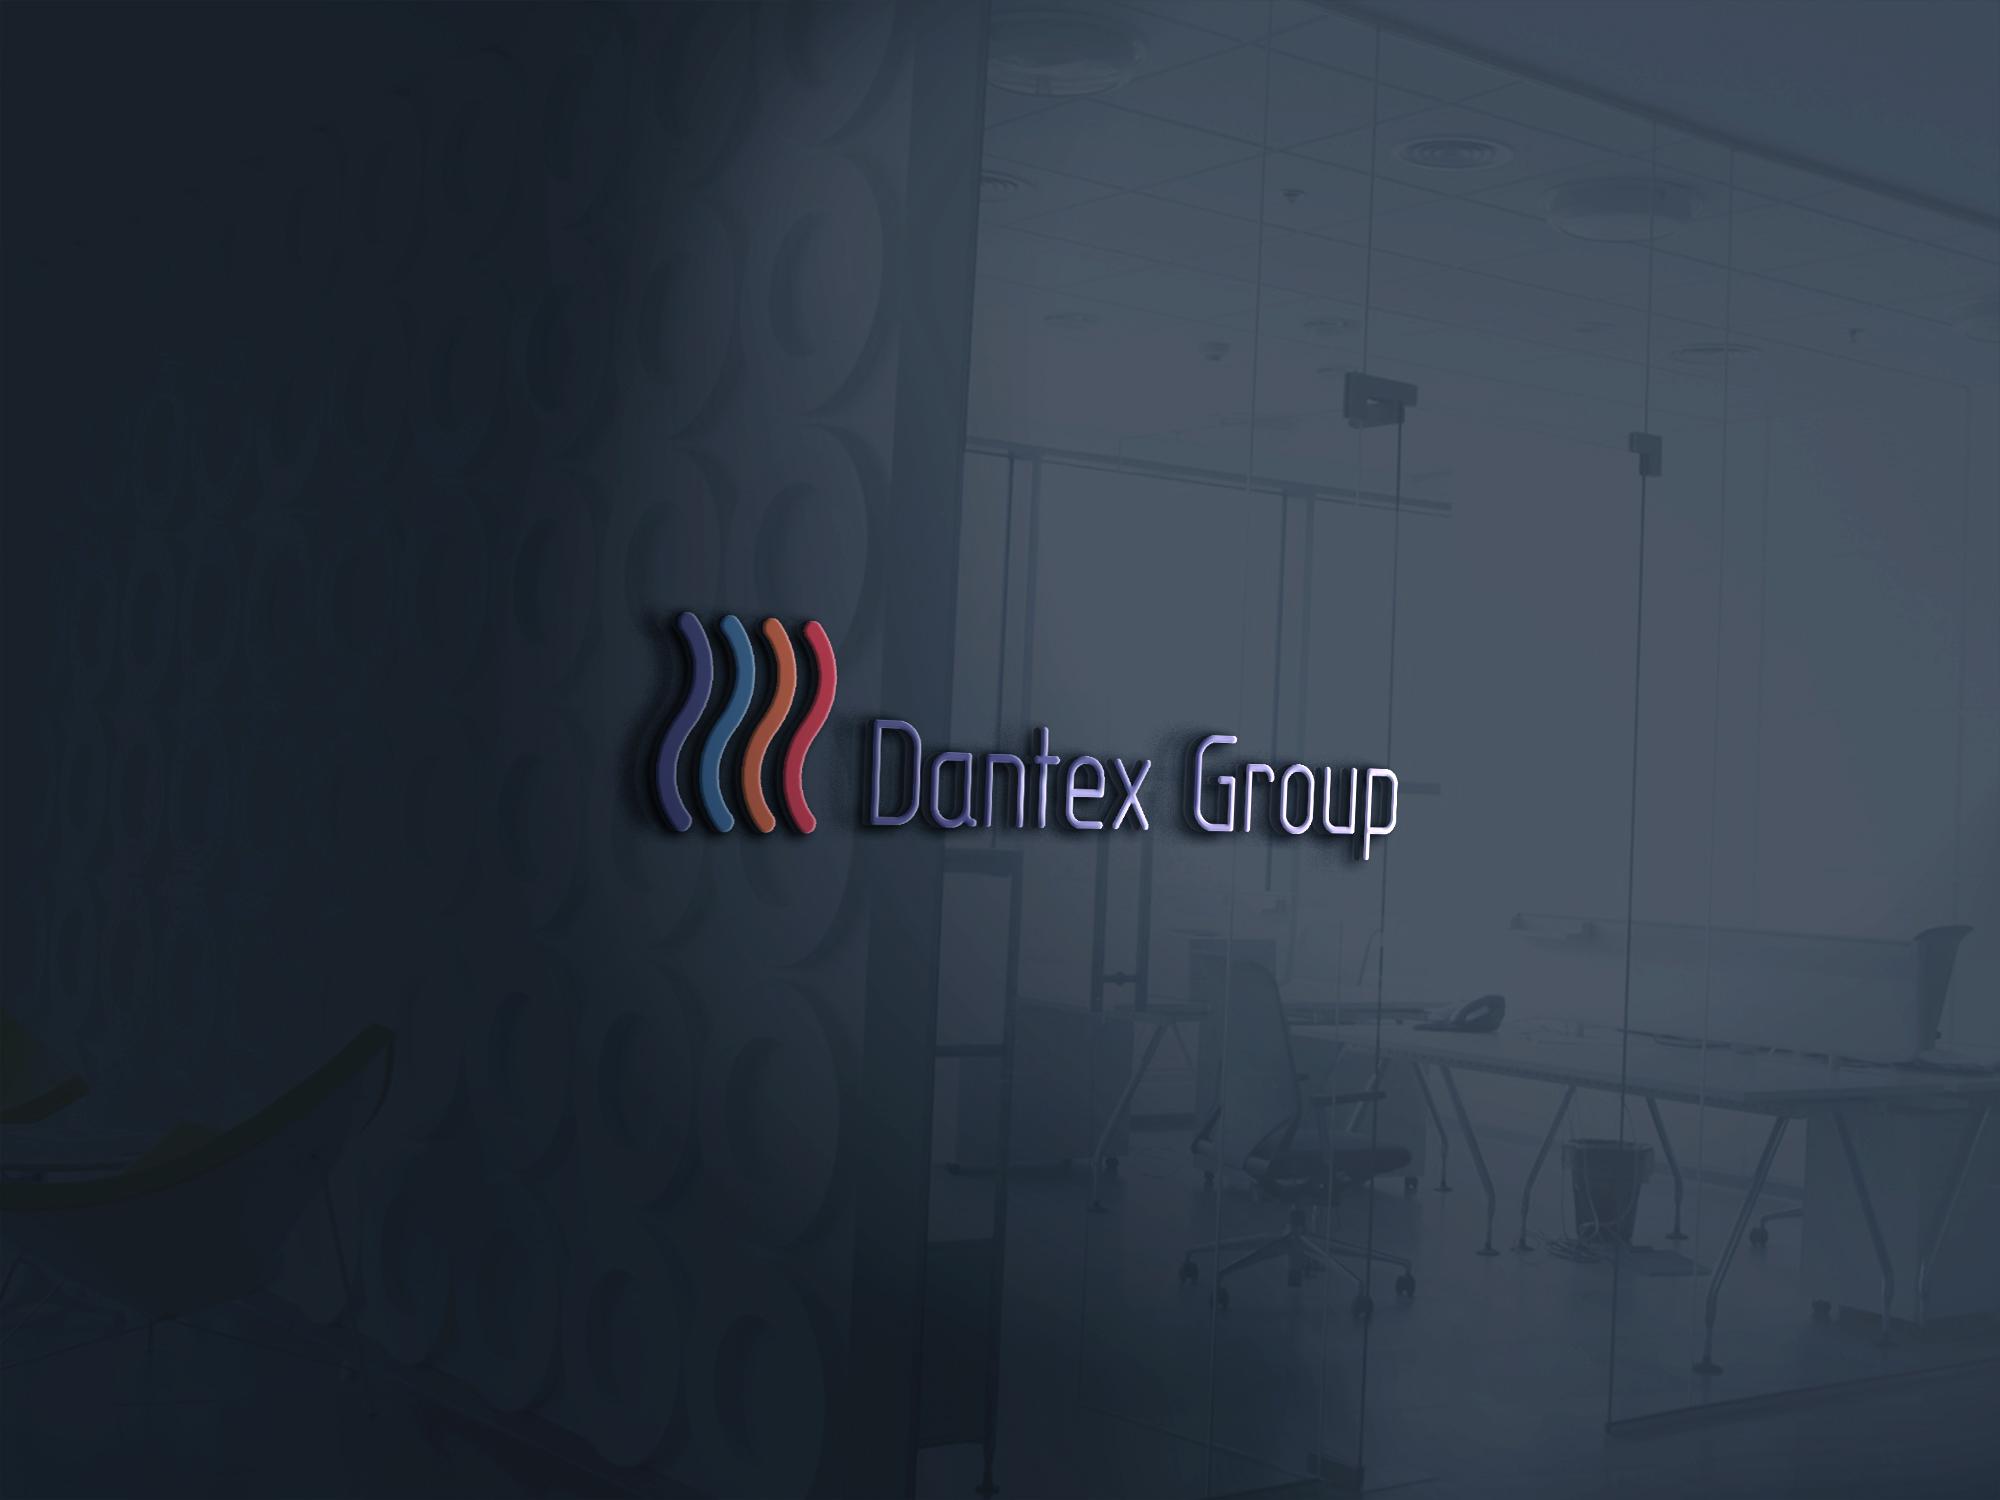 Конкурс на разработку логотипа для компании Dantex Group  фото f_0925c10083c31762.jpg